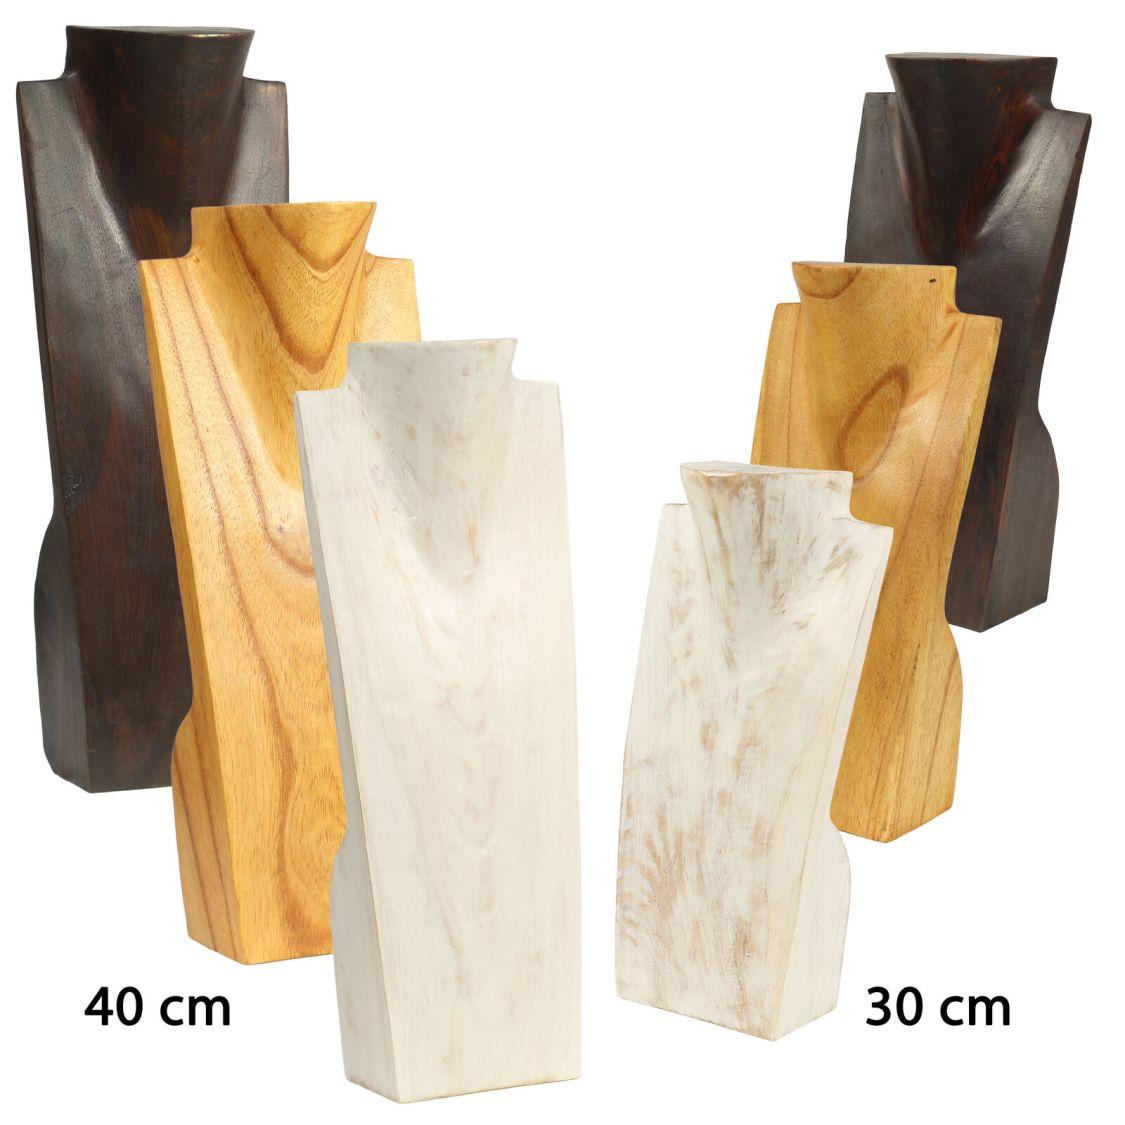 Schmuckhalter Büste Schmuckständer Schmuck Ketten Halskette Holz Kettenhalter